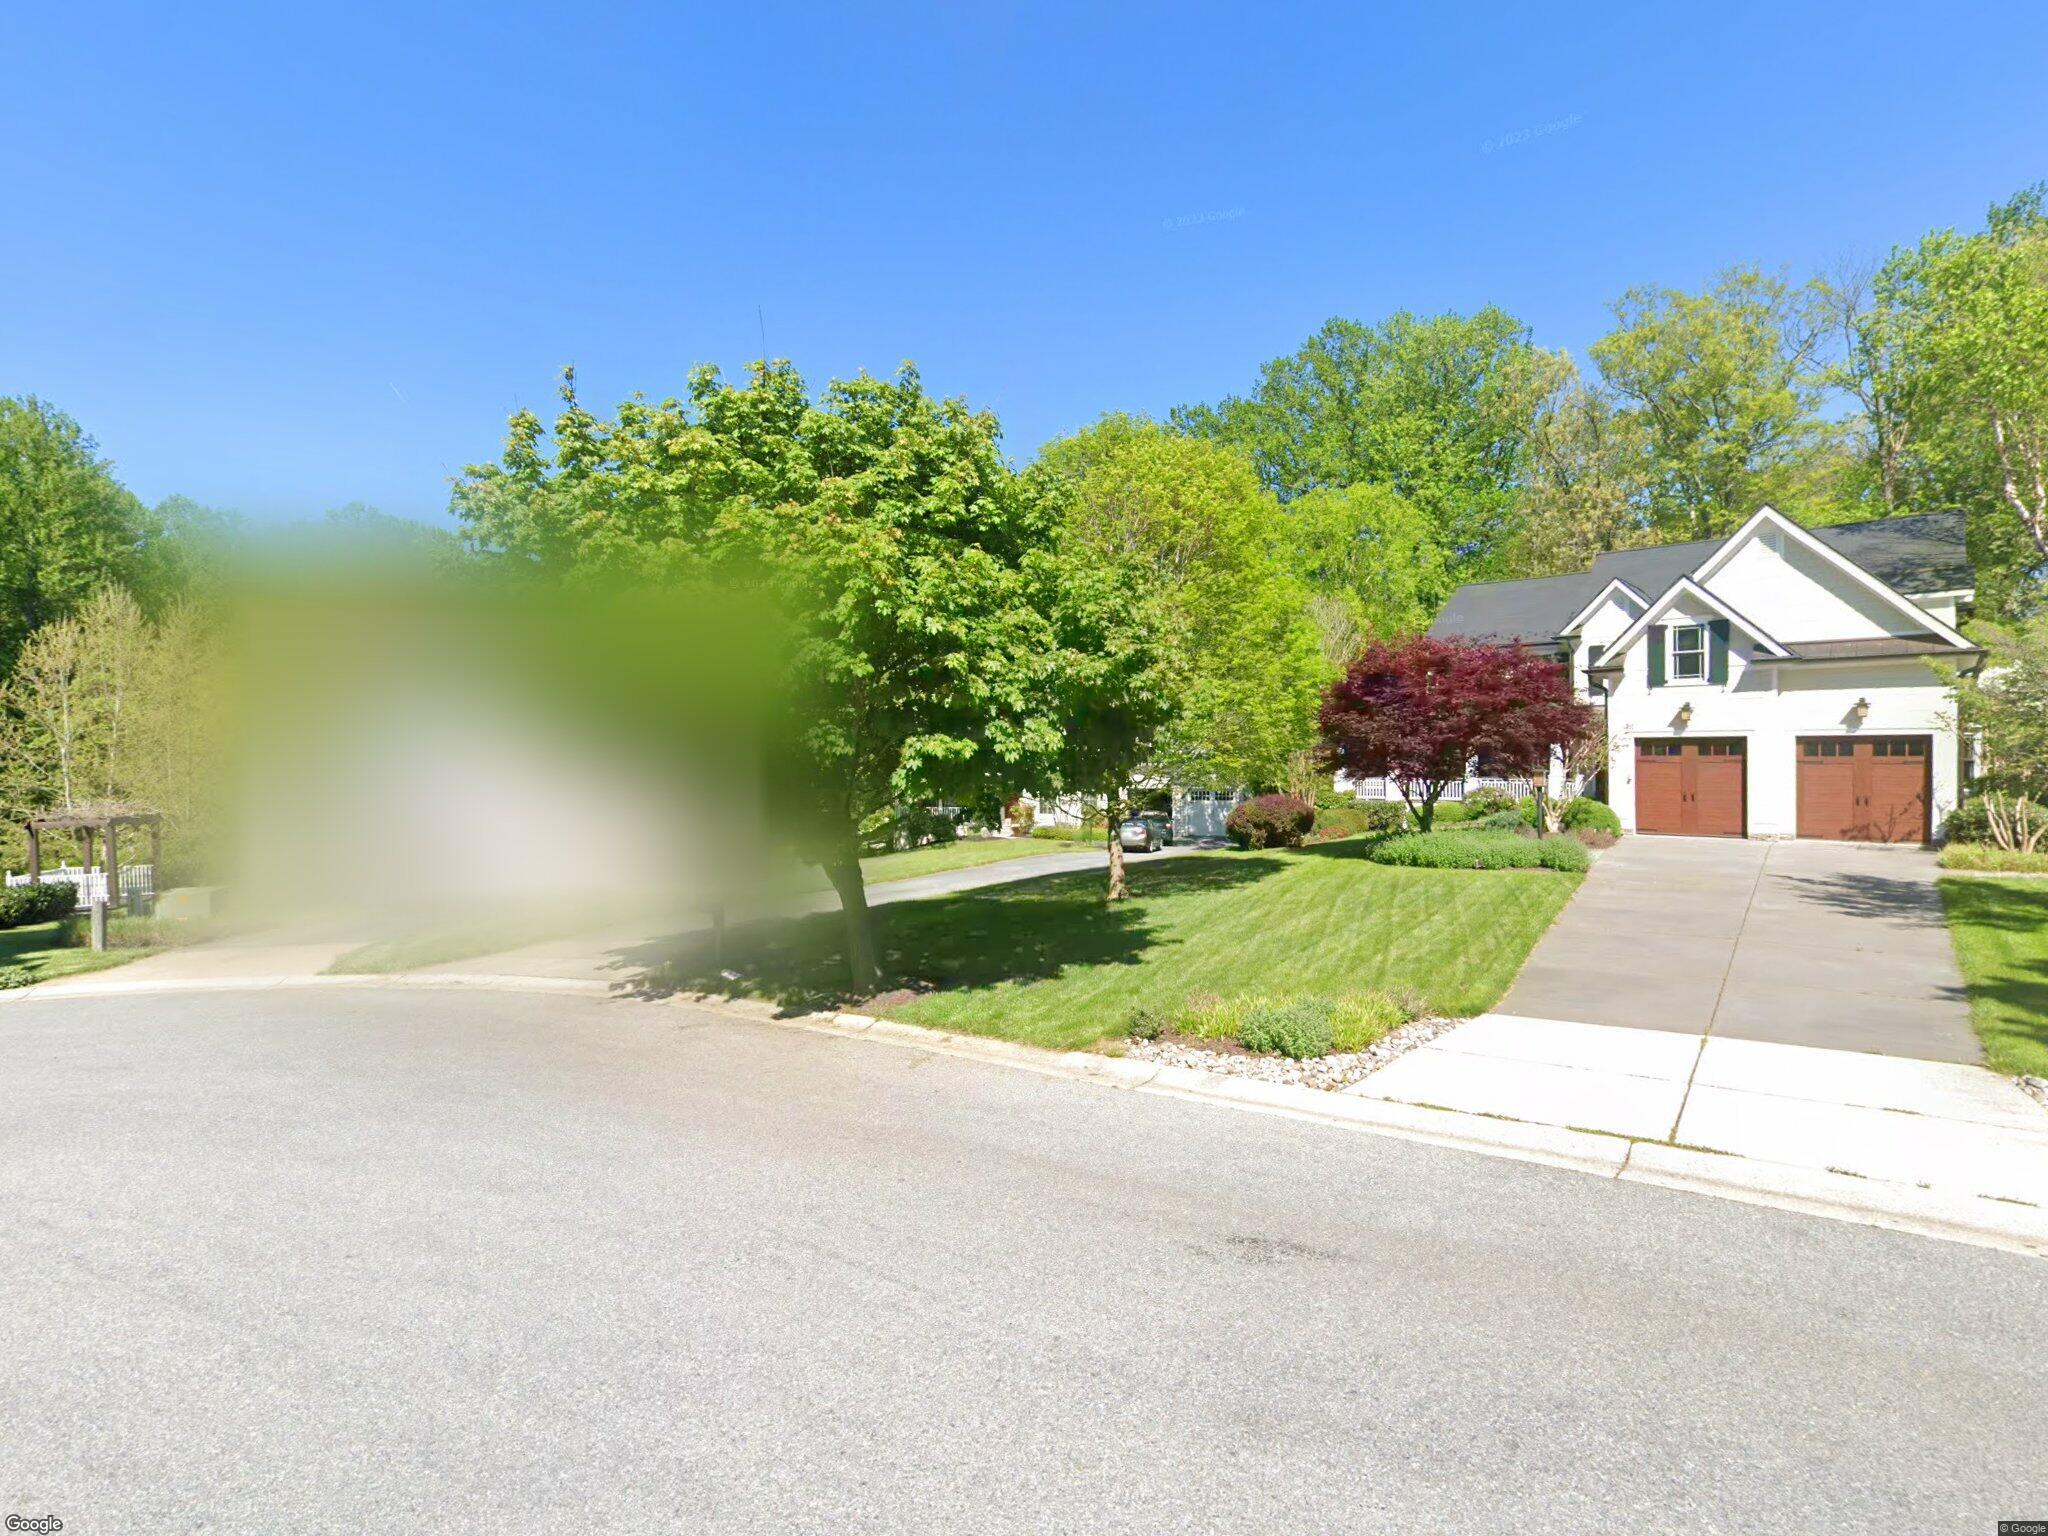 2245 ballard way, ellicott city, md 21042 | trulia